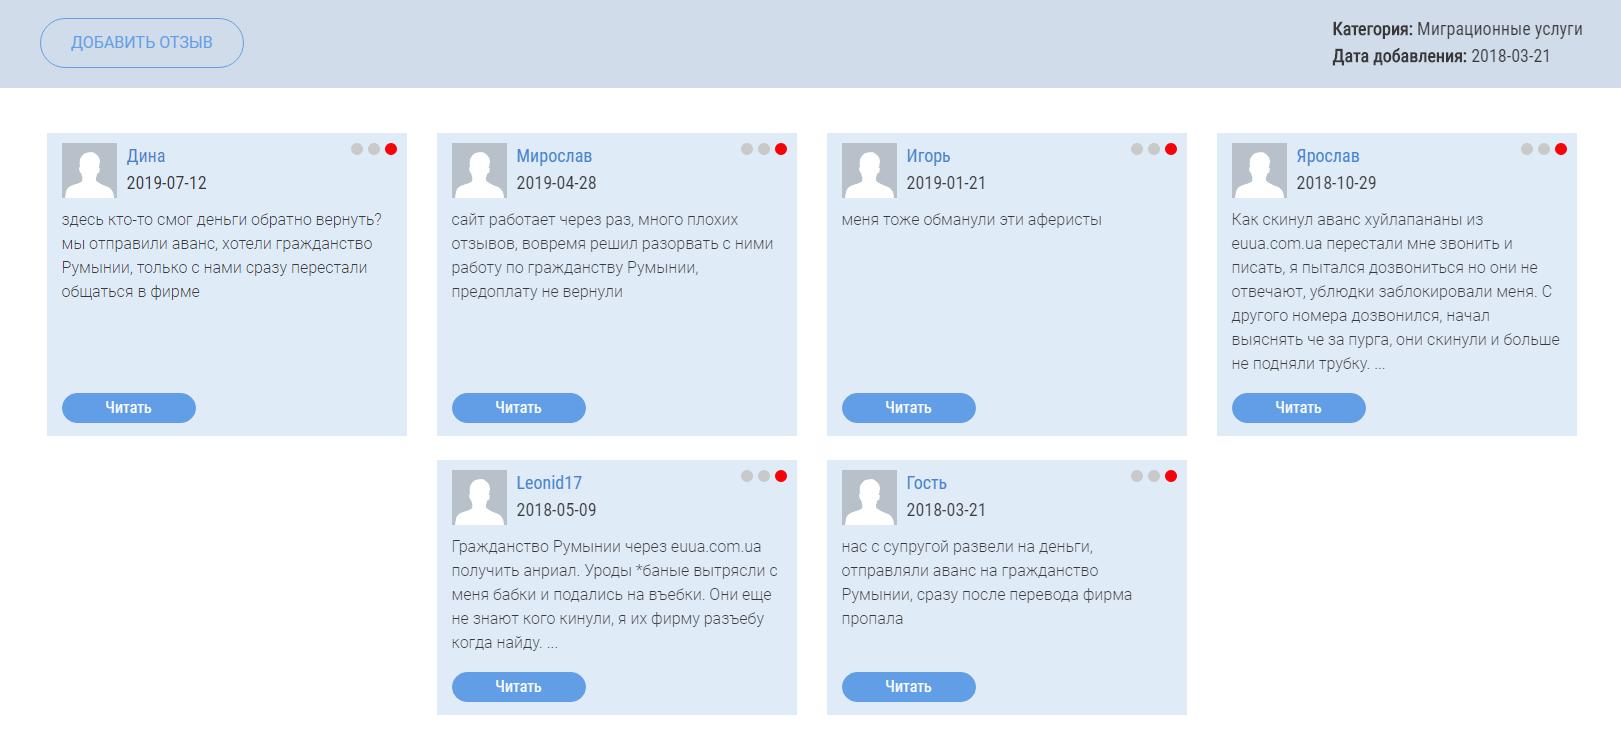 Отзывы о euua.com.ua на glav-otzyv.ru